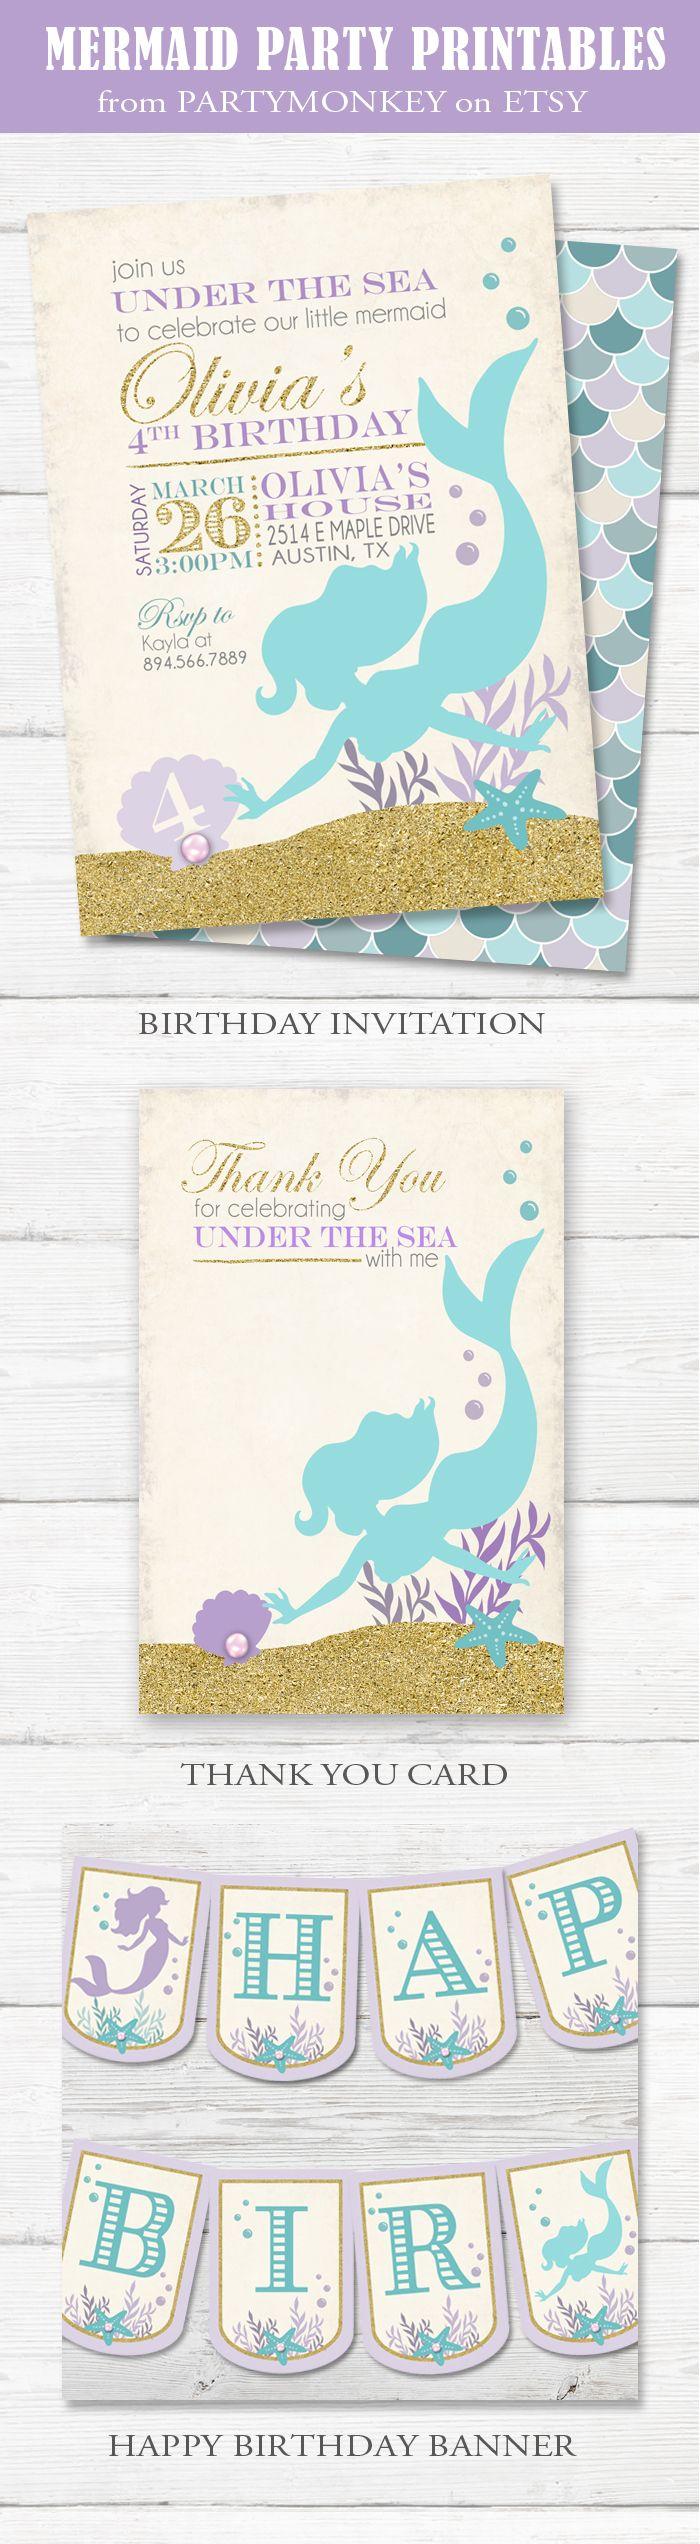 72 Best Mermaid Birthday Party Images On Pinterest Birthday